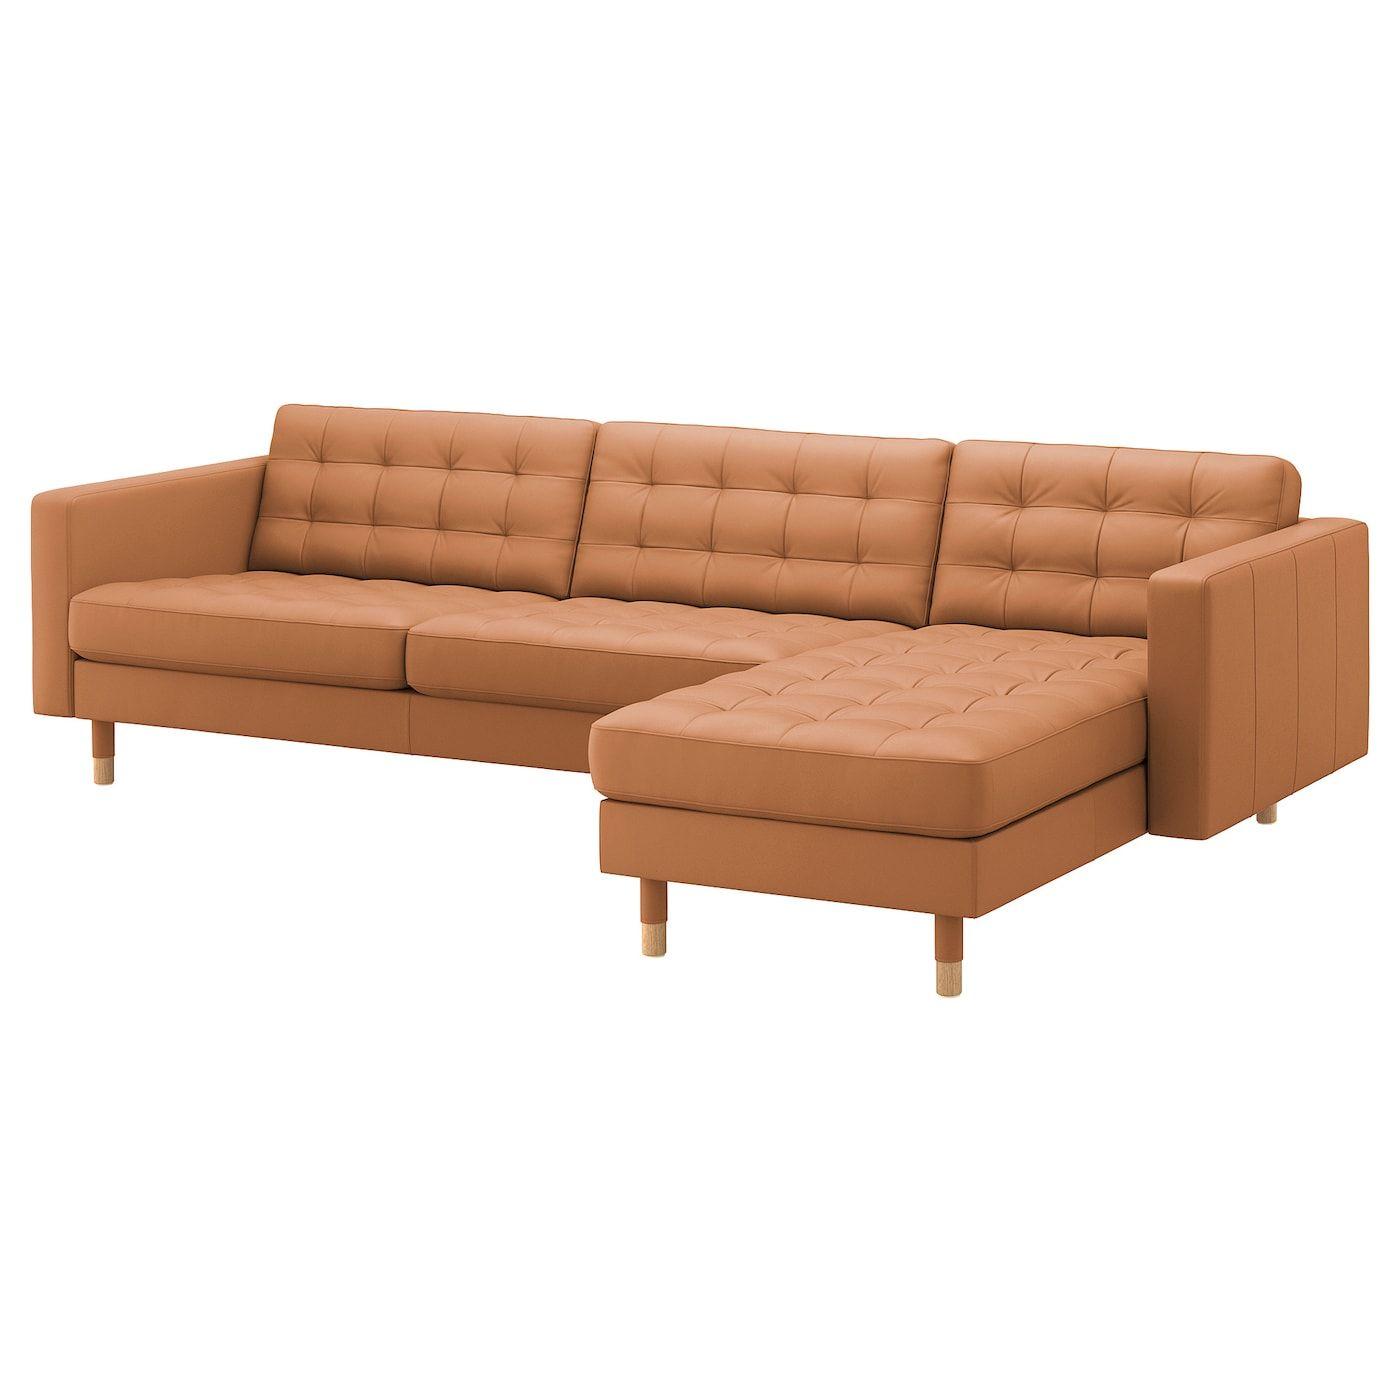 Ikea Us Furniture And Home Furnishings Ikea Landskrona Leather Sofa Landskrona Sofa